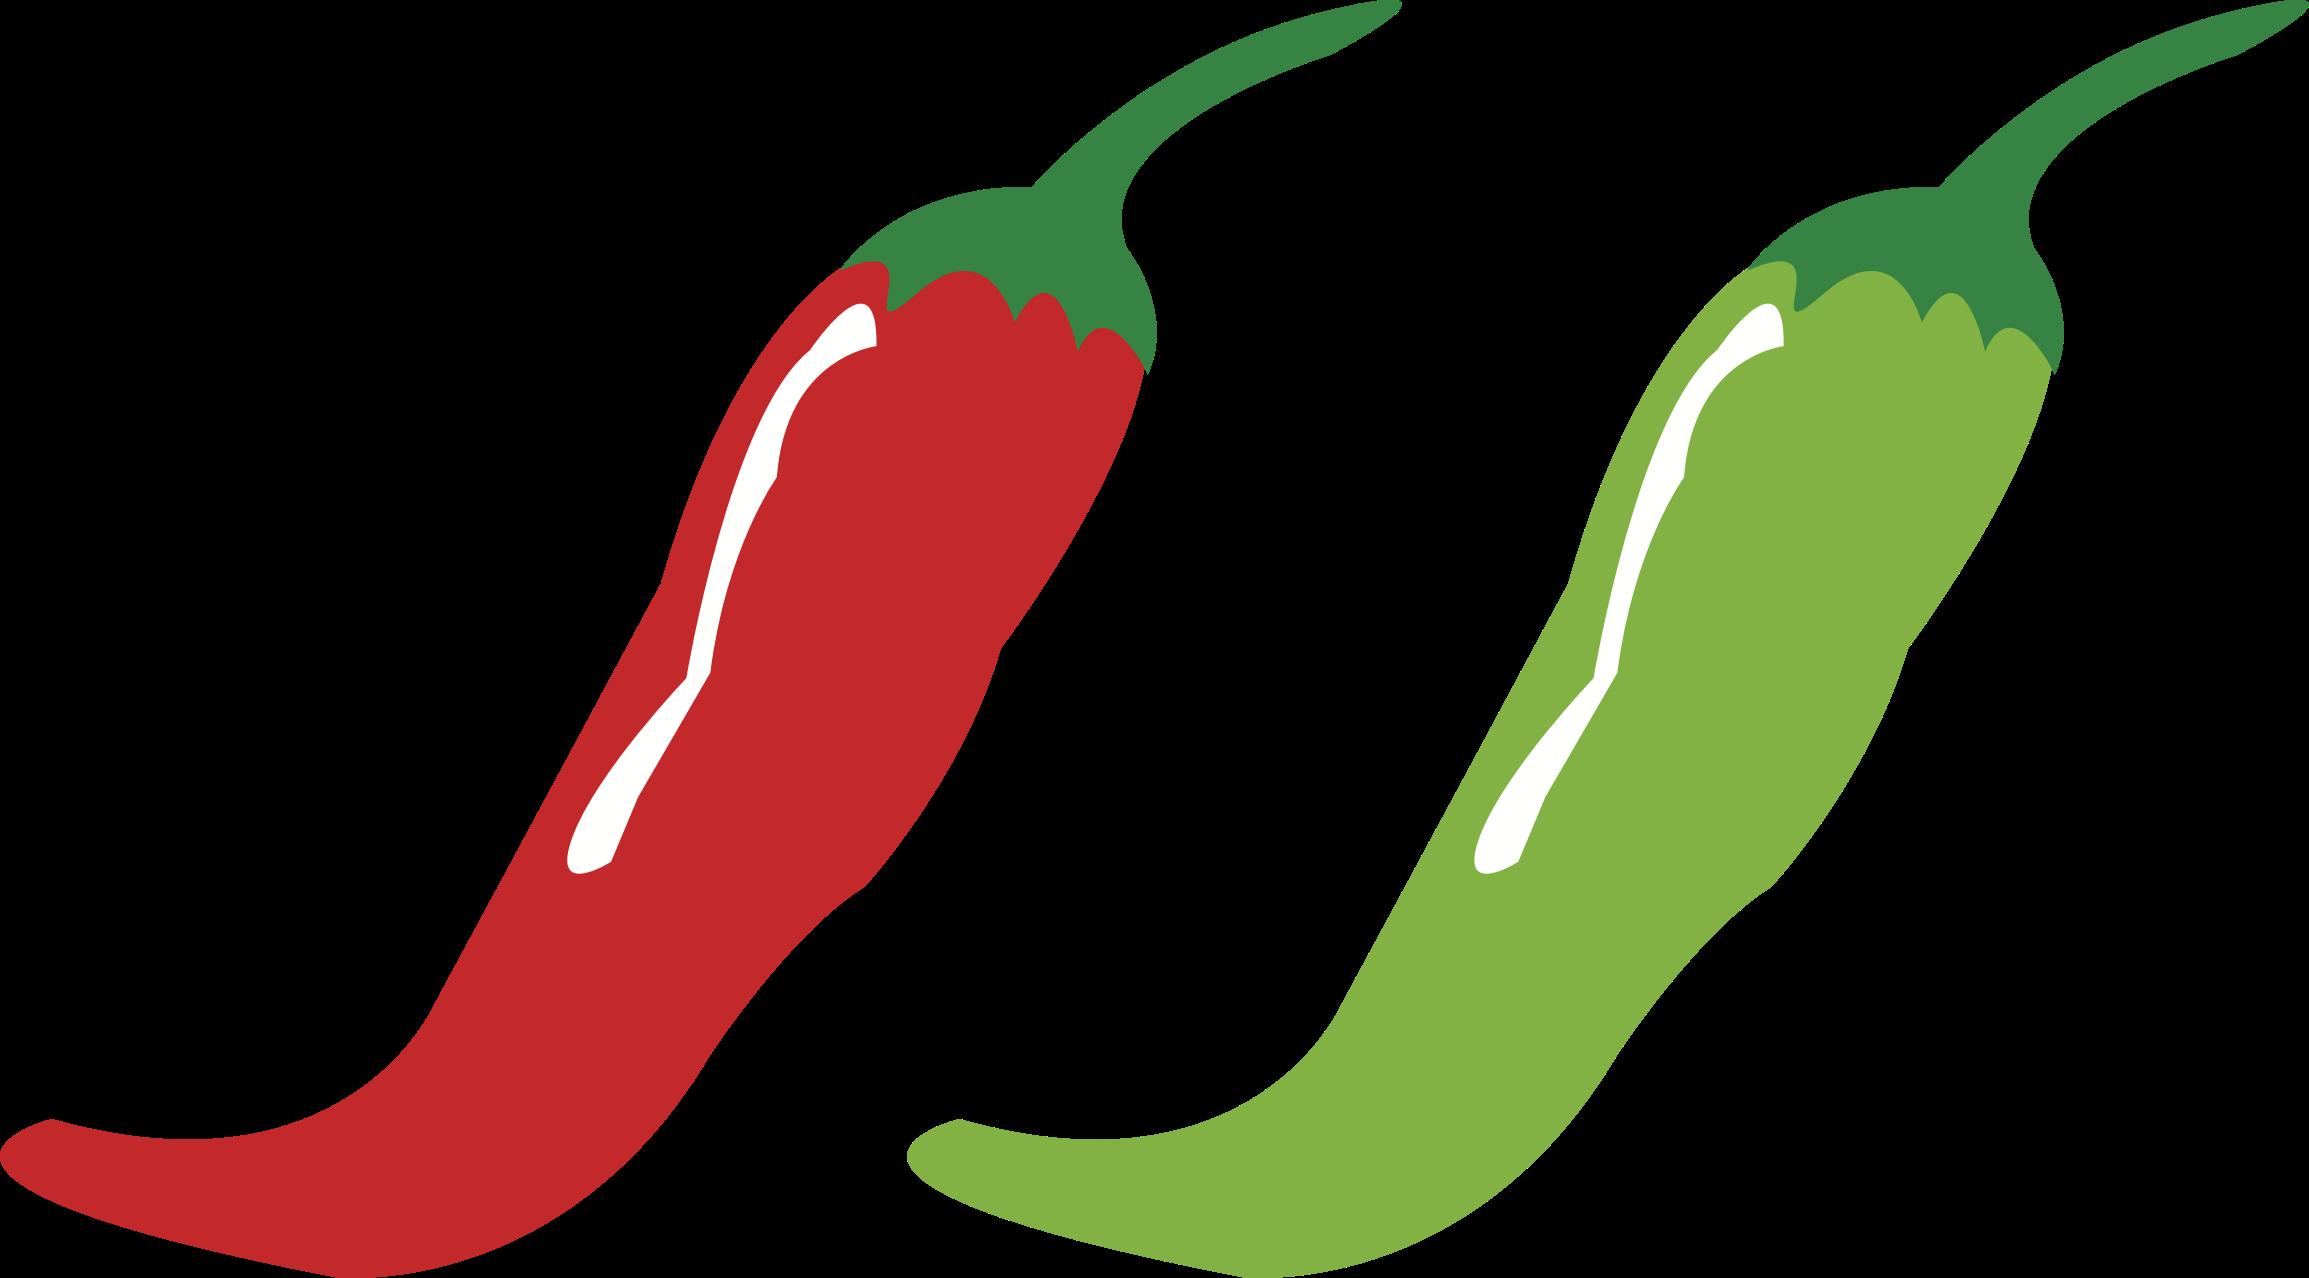 2309x1278 Tabasco Pepper Serrano Pepper Bird's Eye Chili Cayenne Pepper Clip